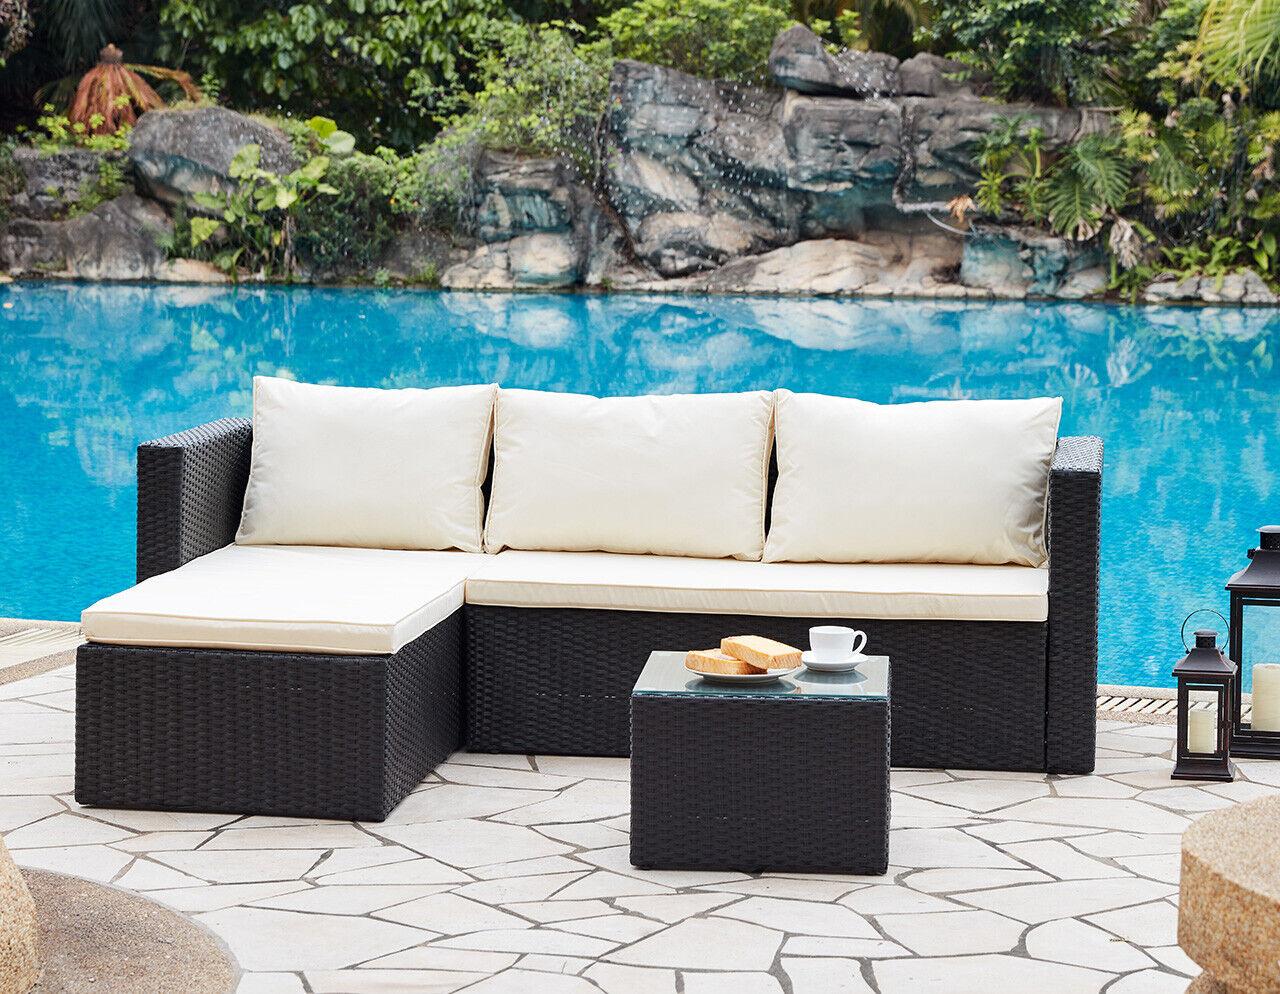 Garden Furniture - Outdoor Sofa Set Garden Furniture Black Grey or Dark Brown Table, Chaise, Sofa